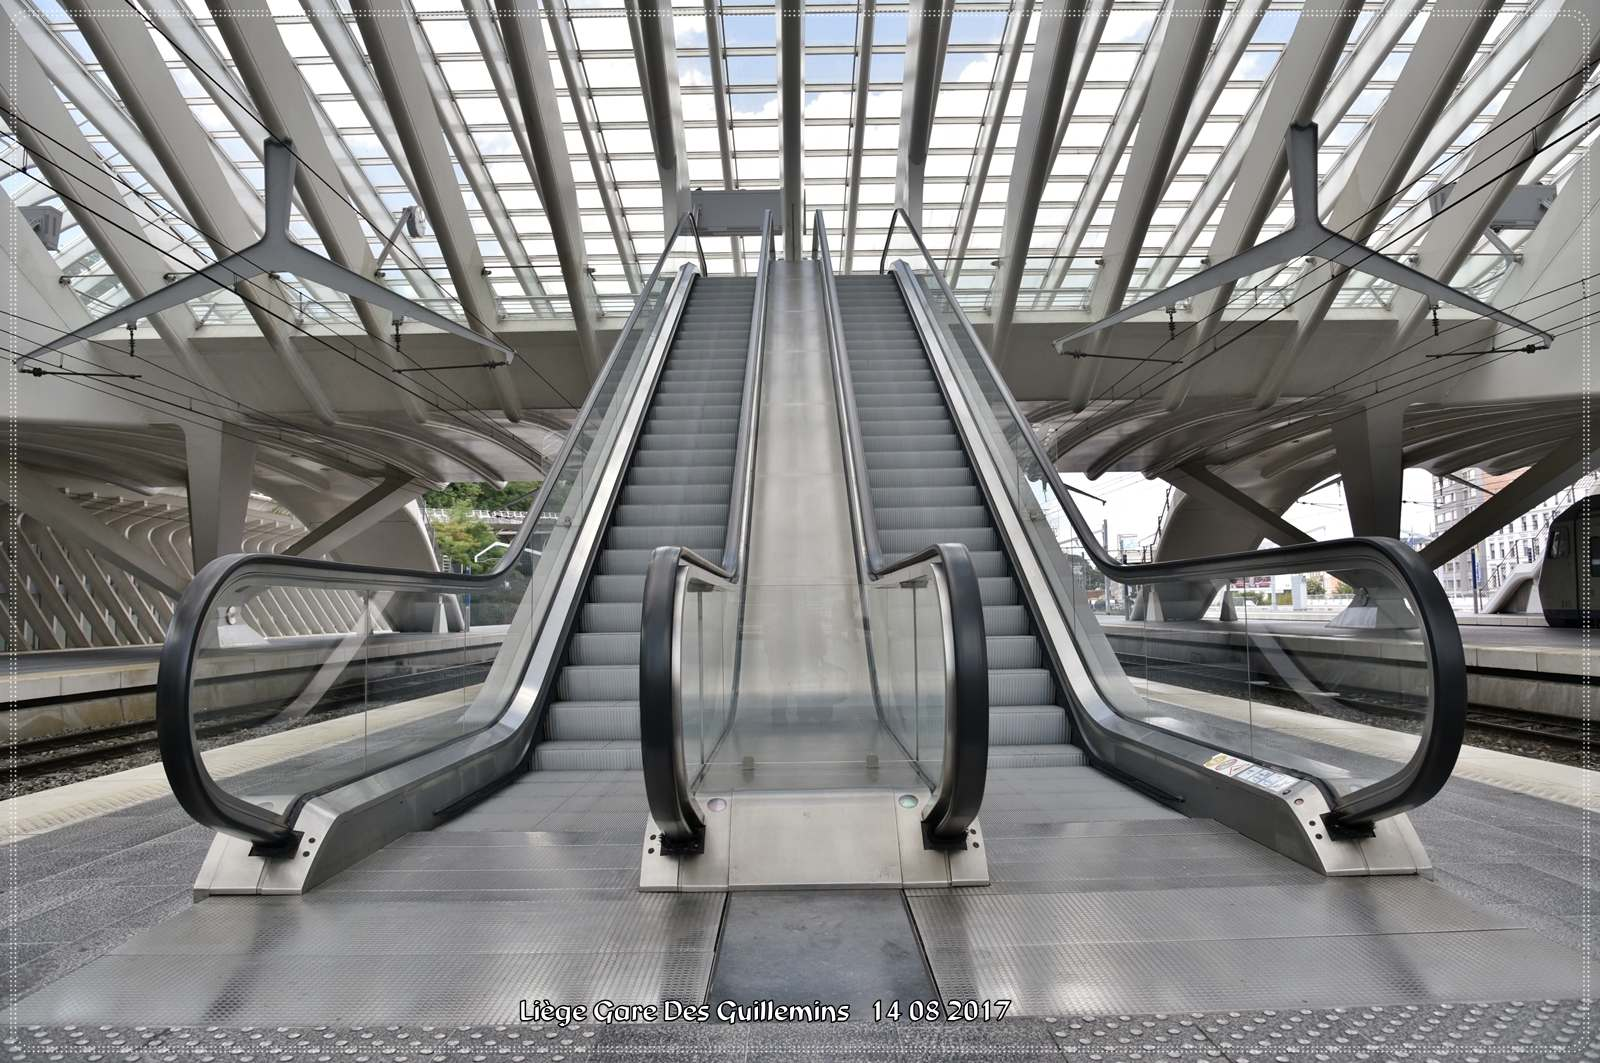 gare des guillemins4 Liege Guillemins Railway Station by Santiago Calatrava